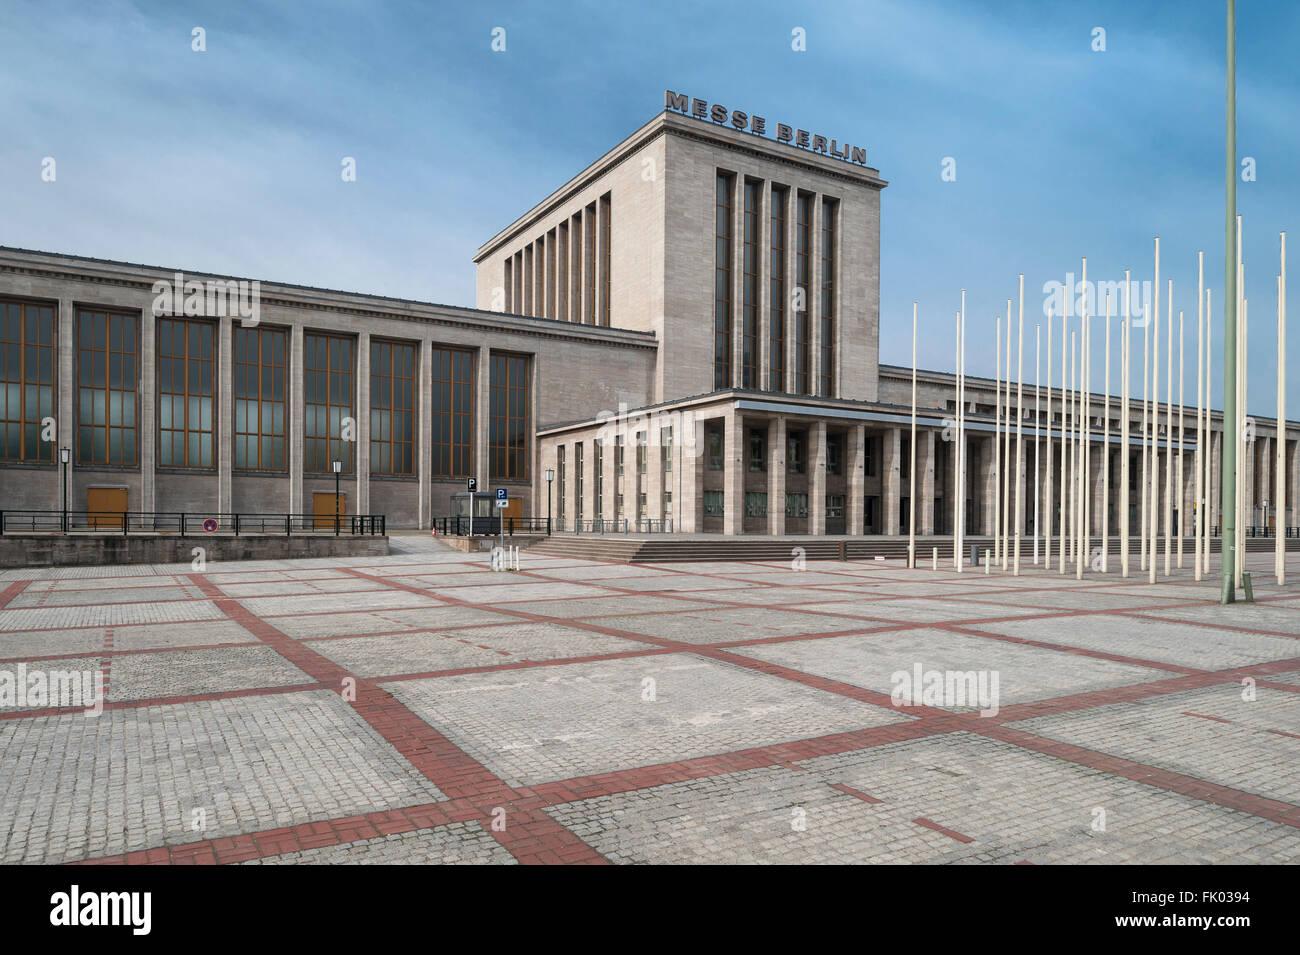 Fair building, main entrance built in 1937 an the Hall of Honour, architect Richard Ermisch, Nazi Monumental Building, - Stock Image